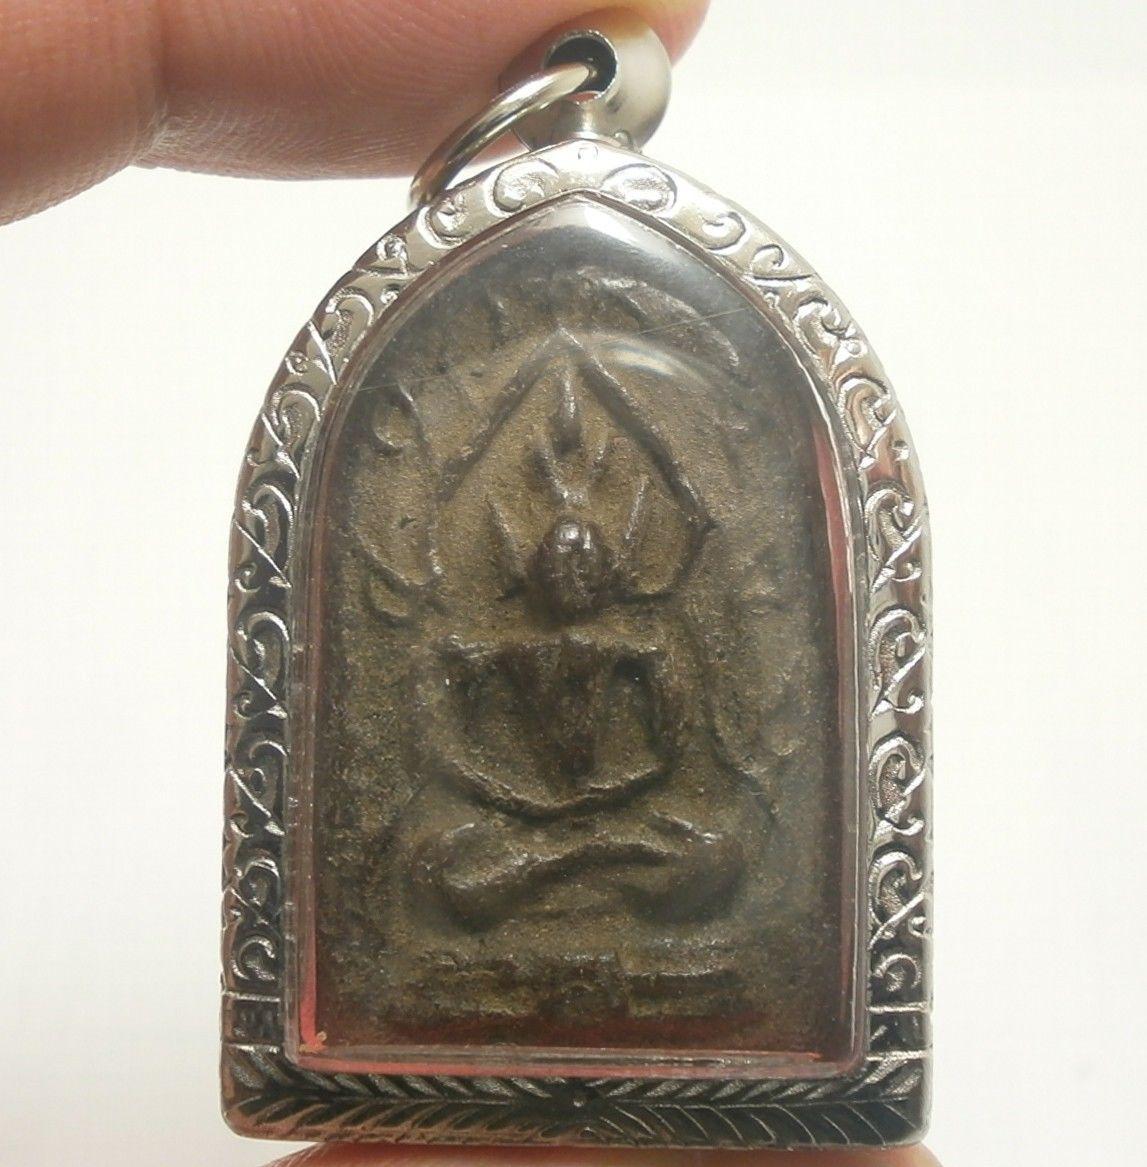 LP BOON BUDDHA IN NIRVANA ENLIGHTEN SHIELD THAI POWERFUL ANTIQUE AMULET PENDANT